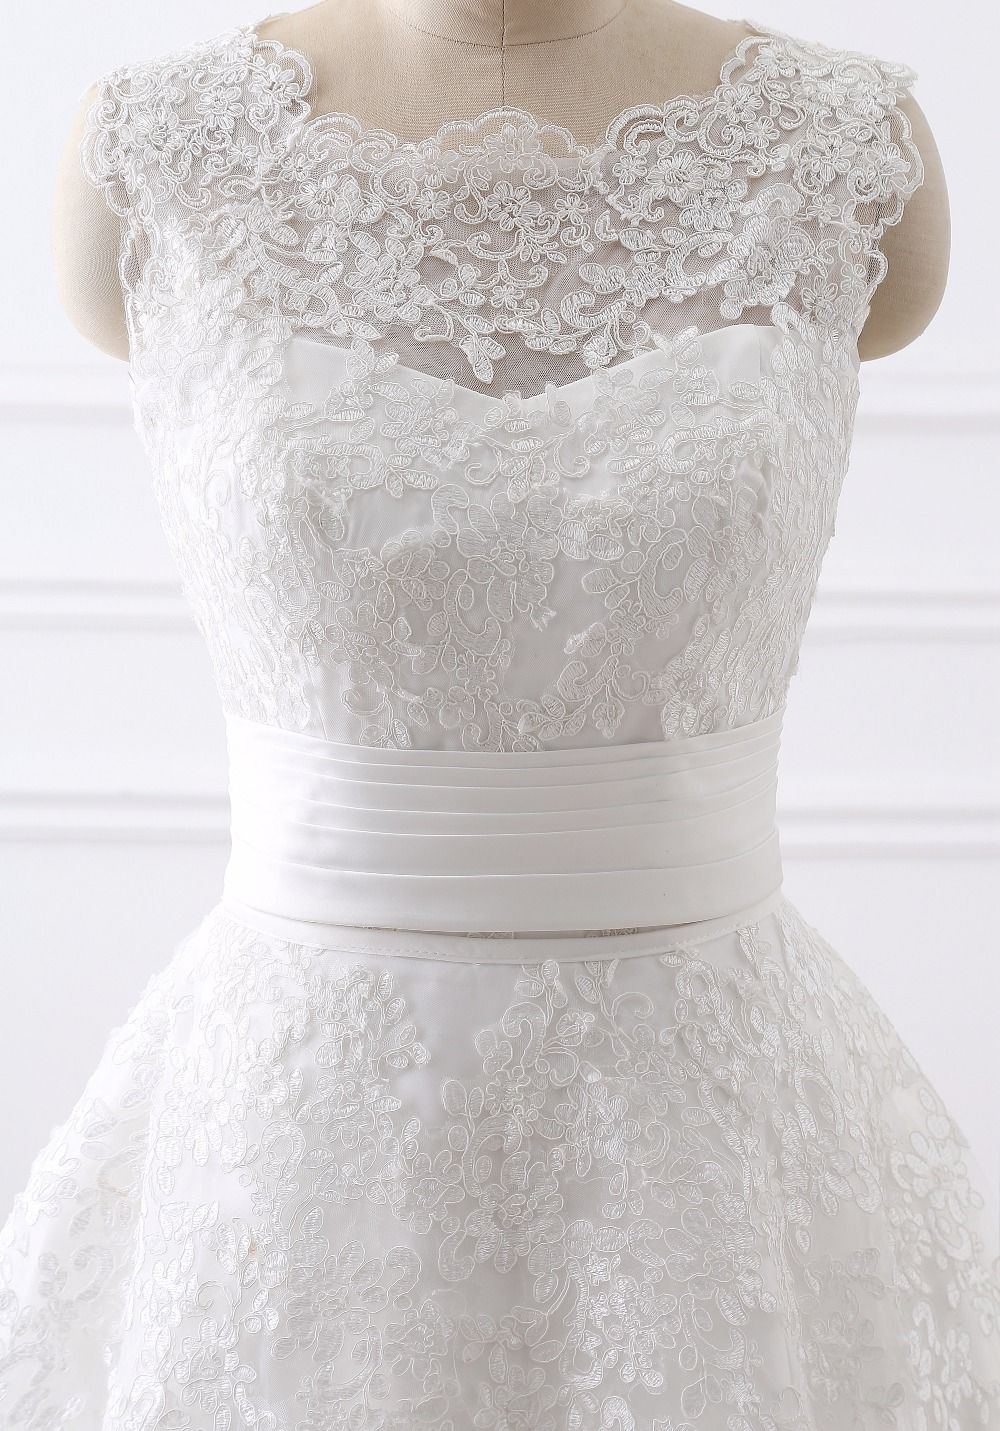 Elegant 2 In 1 Lace Wedding Dress Detachable Skirt High Neck Two Pieces A Line Uniqistic Com Wedding Dress Detachable Skirt Removable Skirt Wedding Dress Wedding Dresses [ 1431 x 1000 Pixel ]